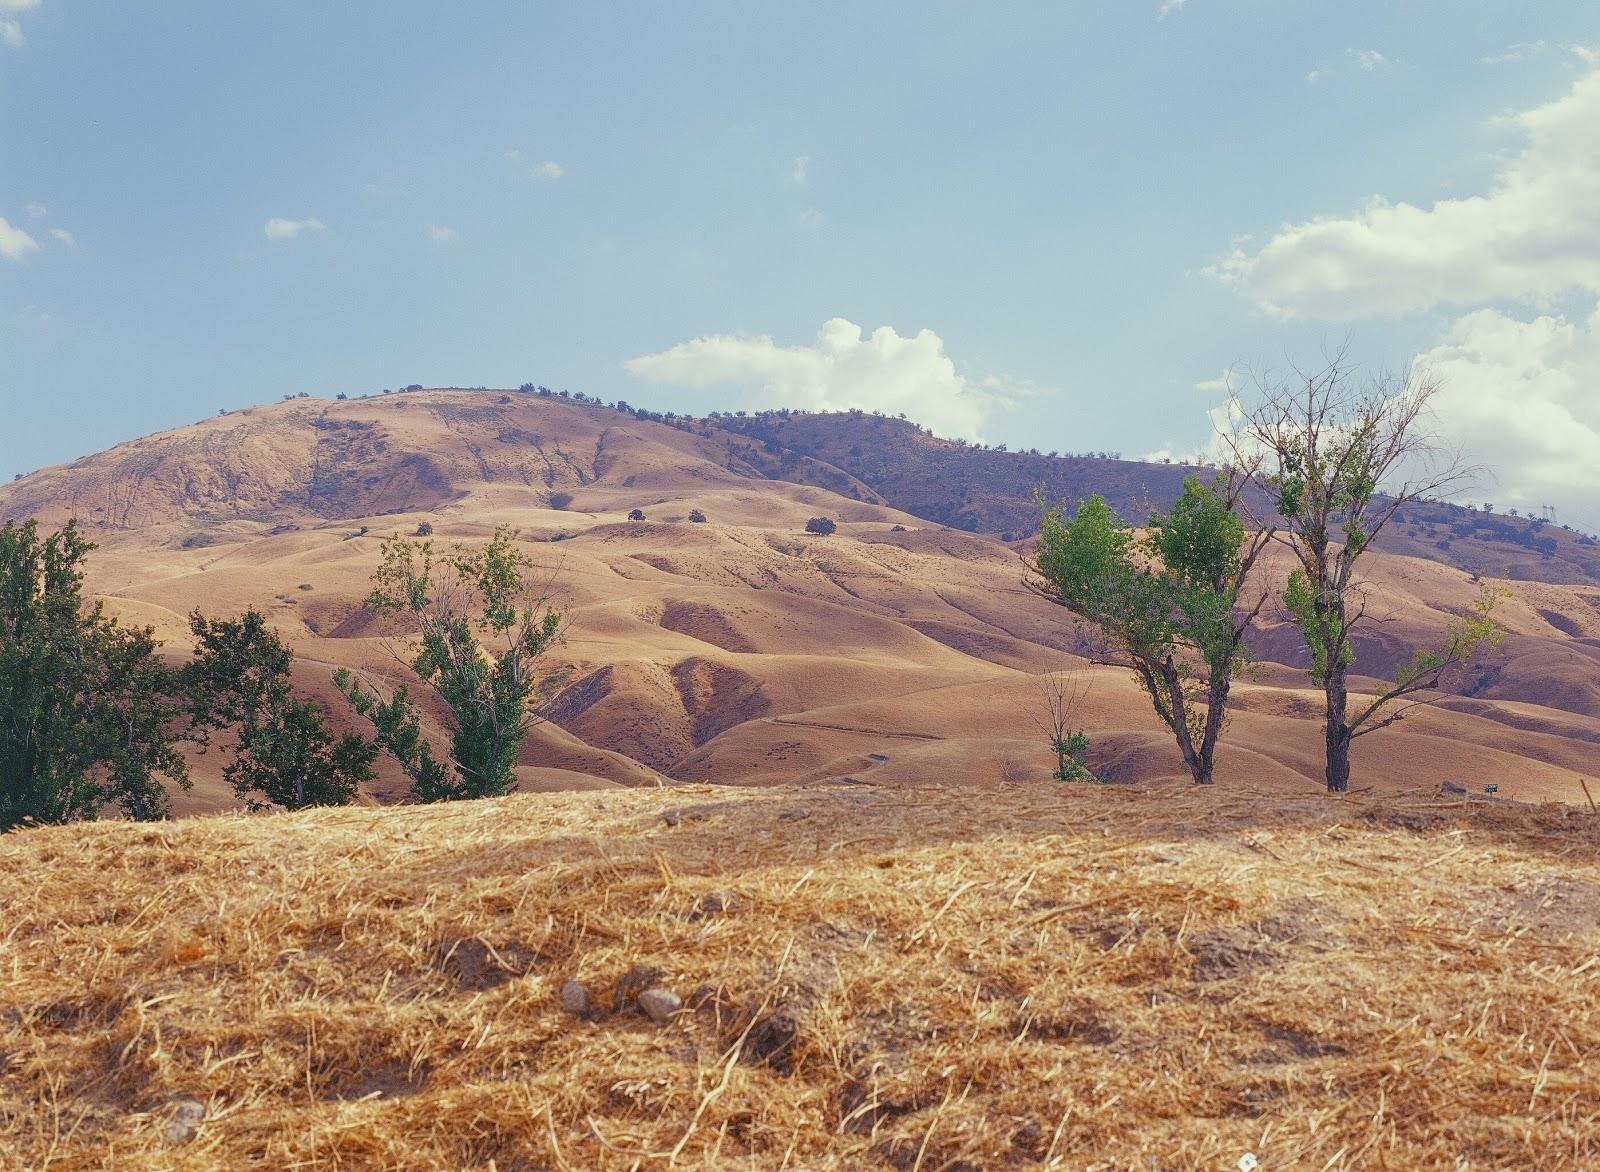 San Joaquin Valley, CA